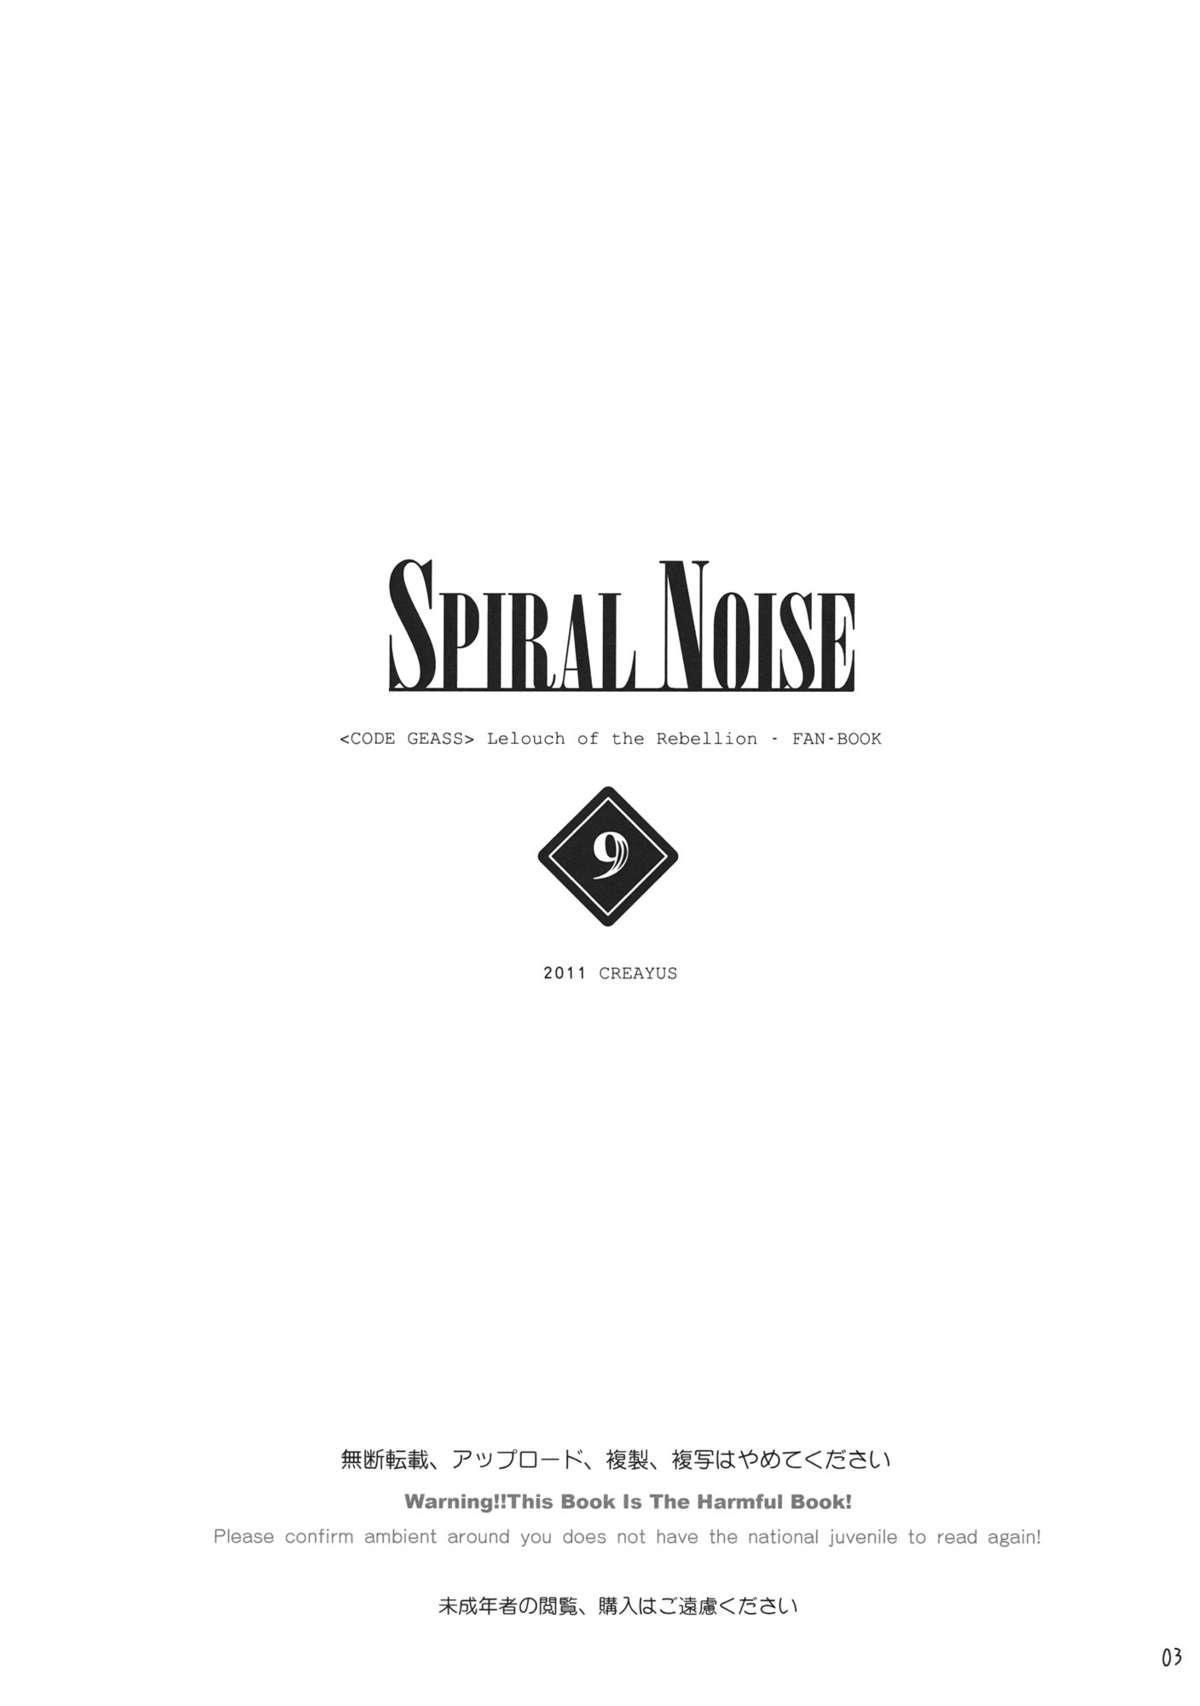 SPIRAL NOISE 2